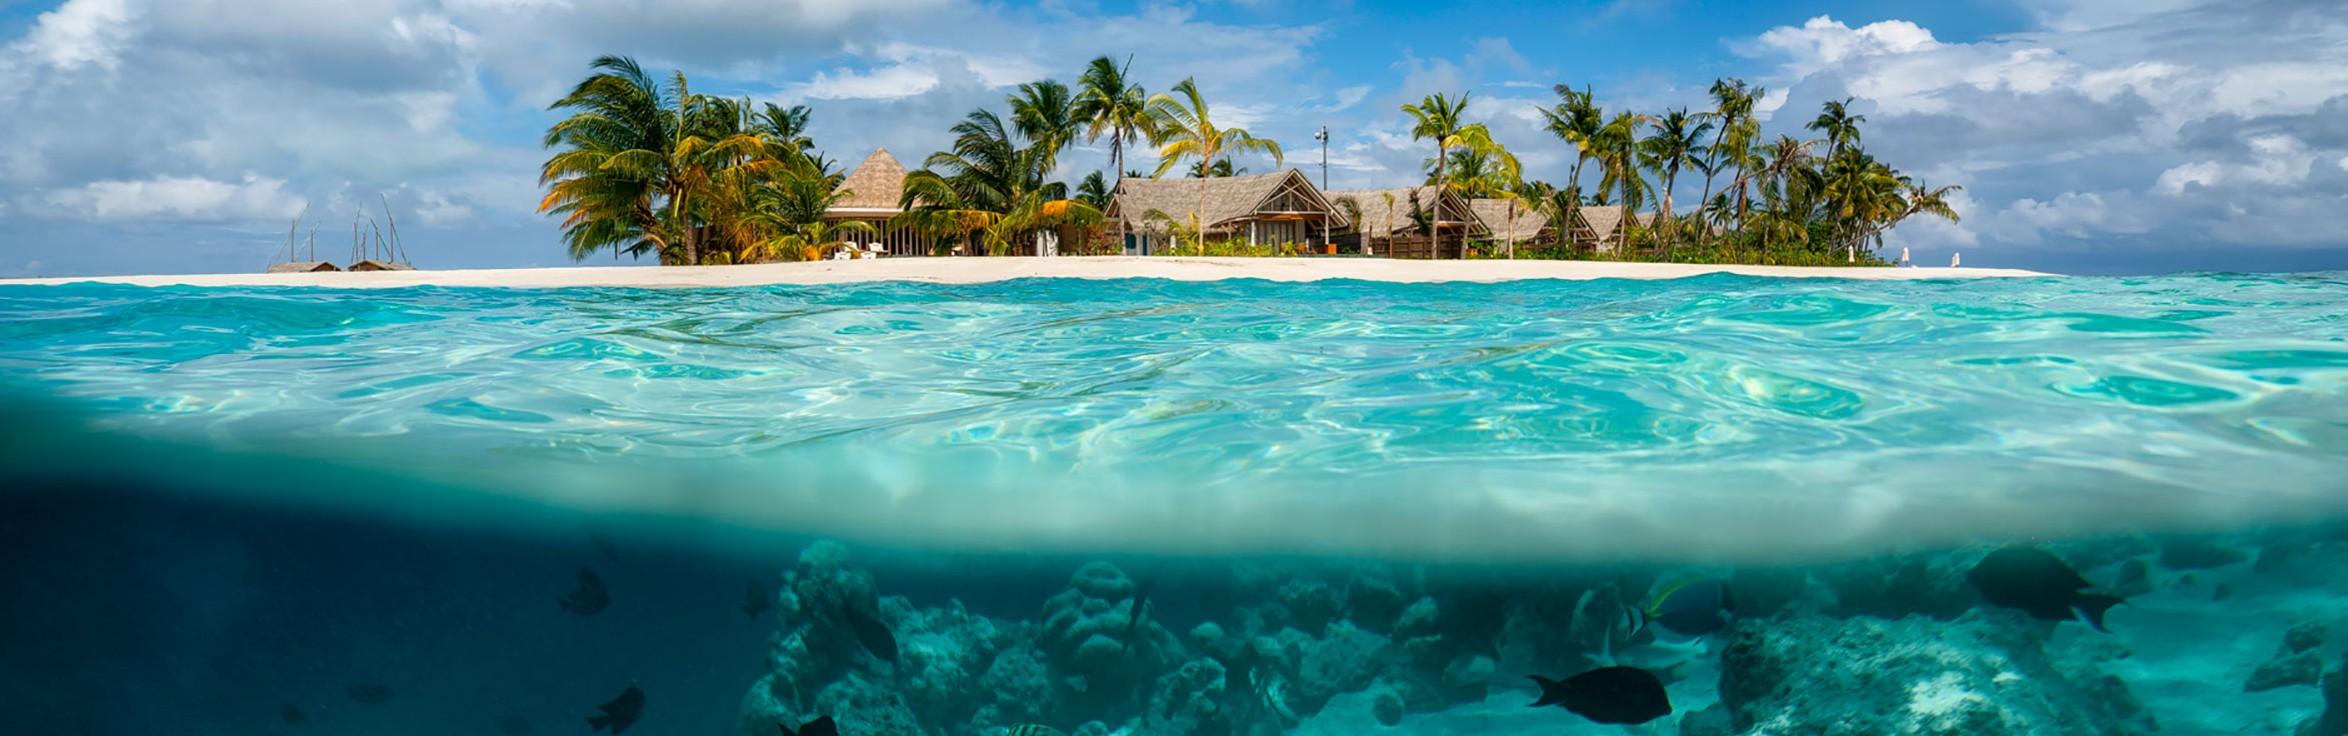 milaidhoo_maldives_misc